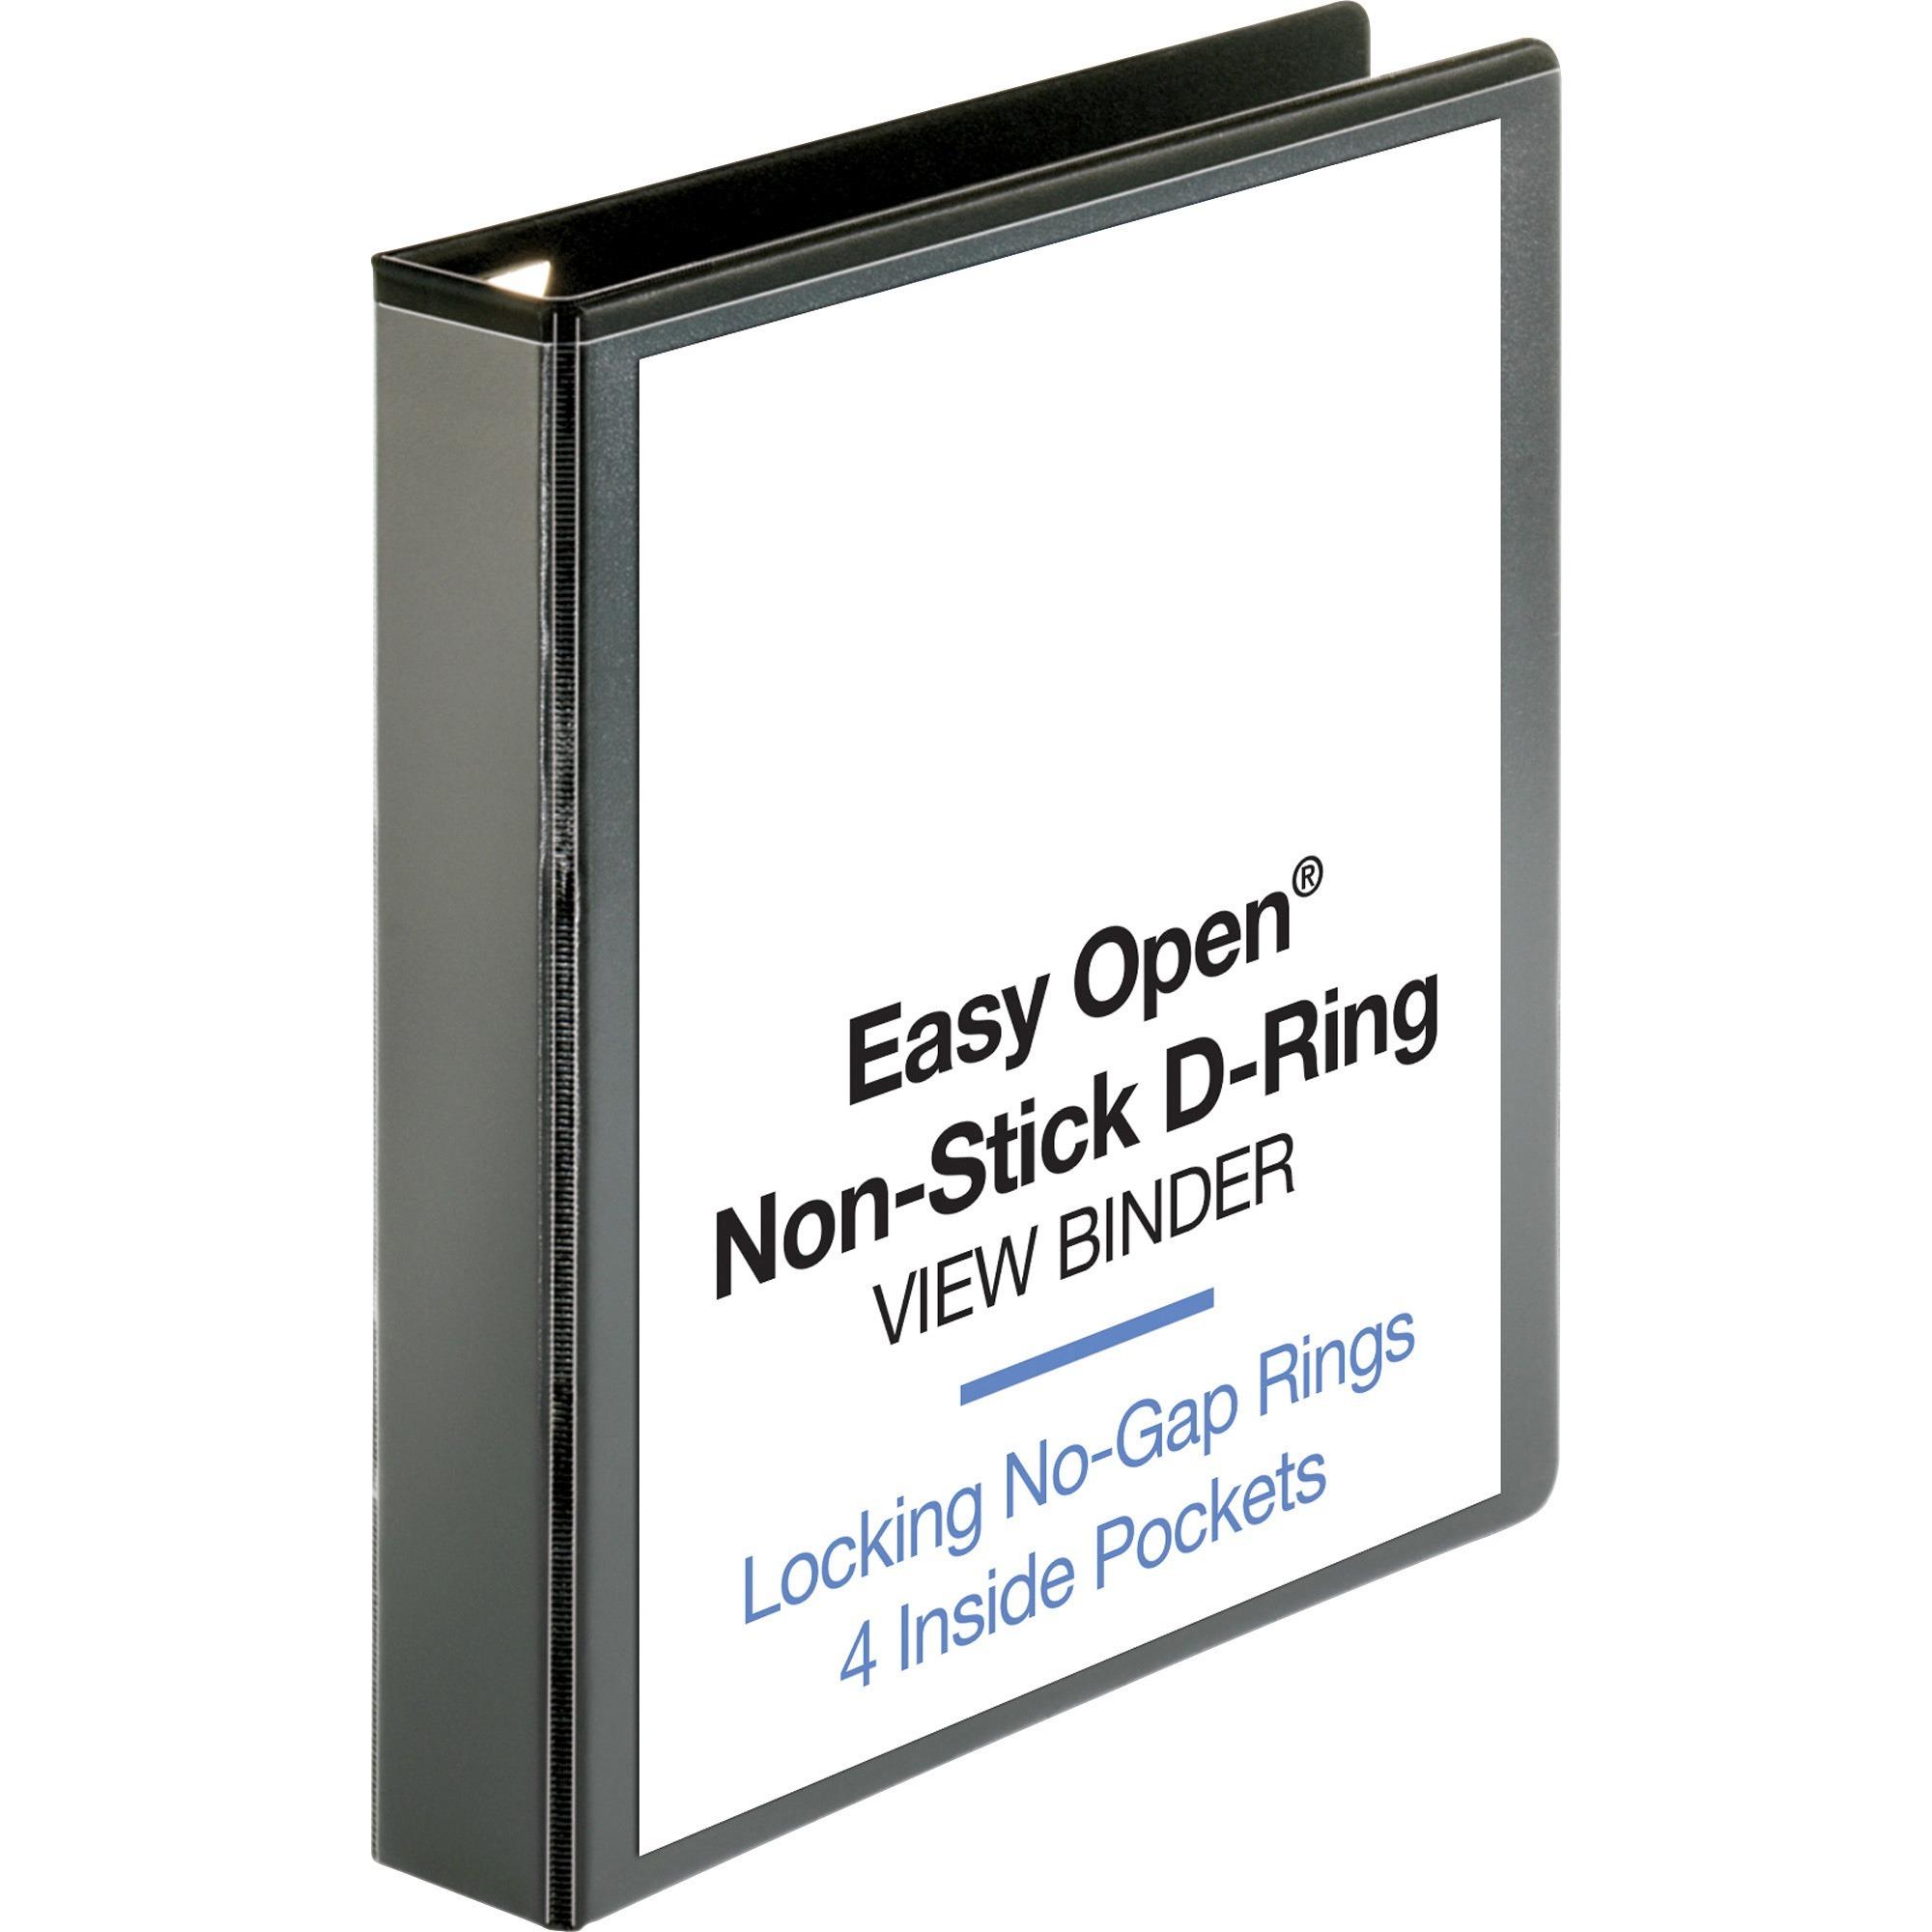 Business Source, BSN26958, Locking D-Ring View Binder, 1 Each, Black